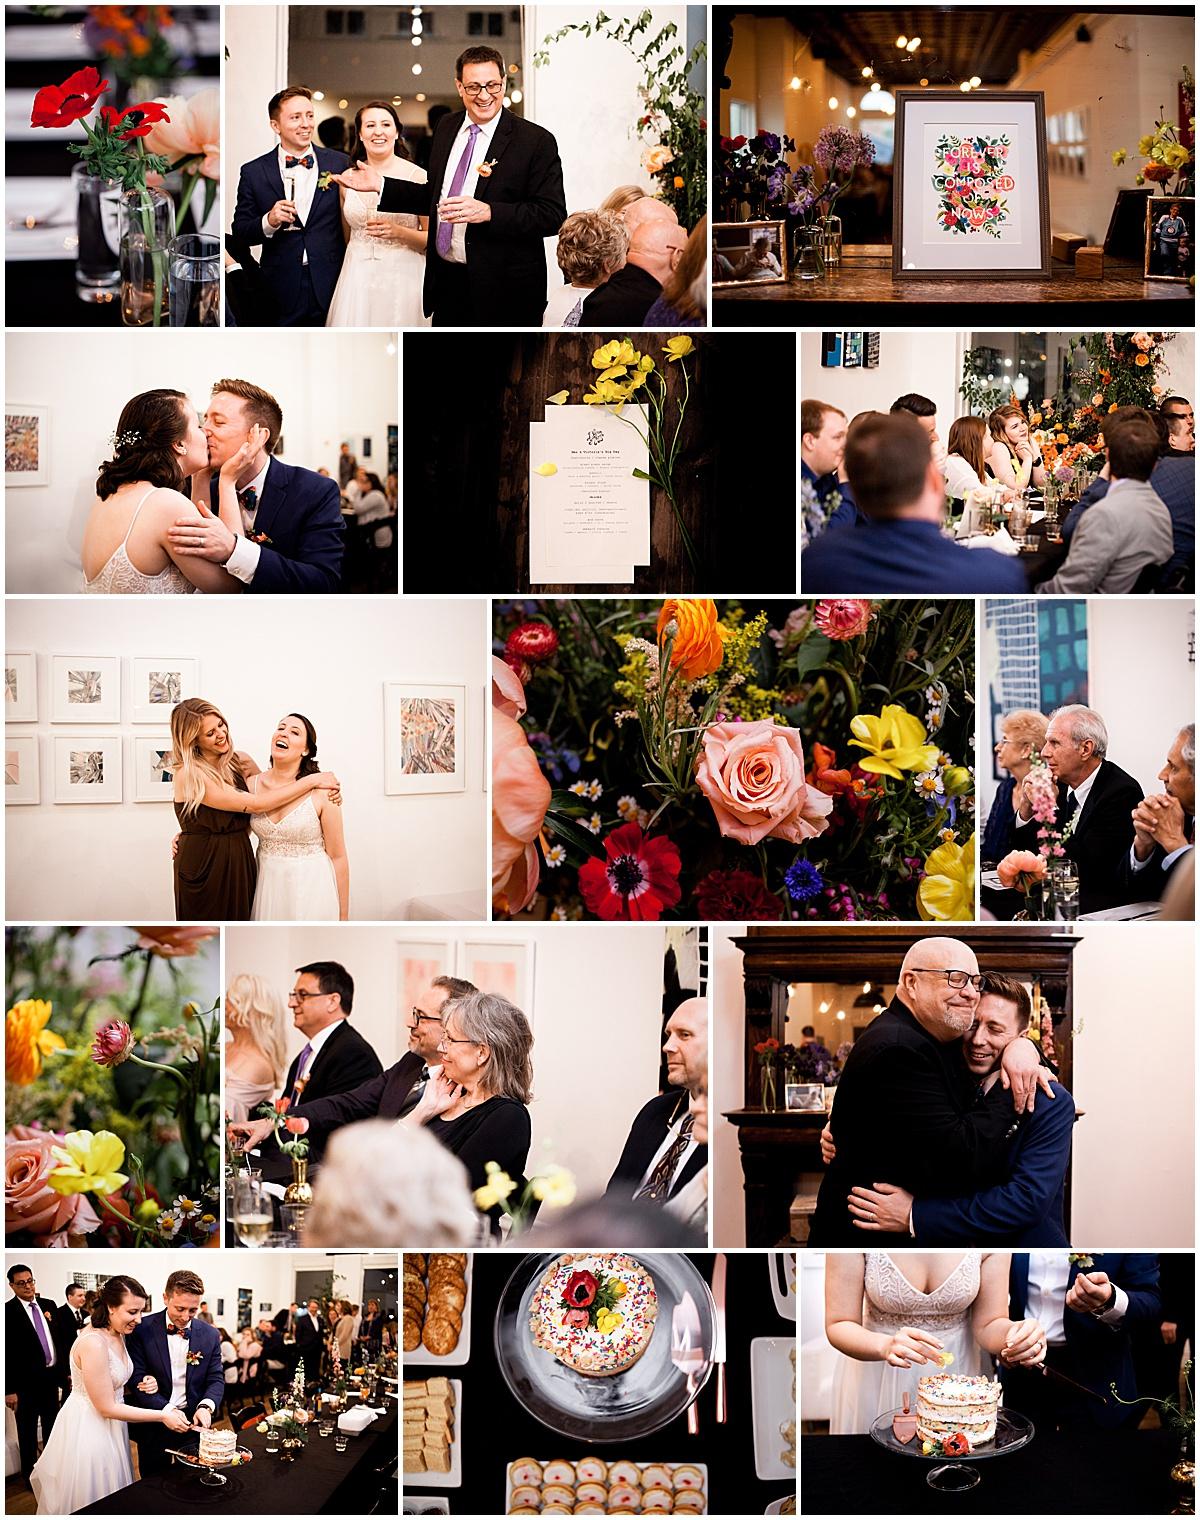 wedding reception bar marco pittsburgh pa